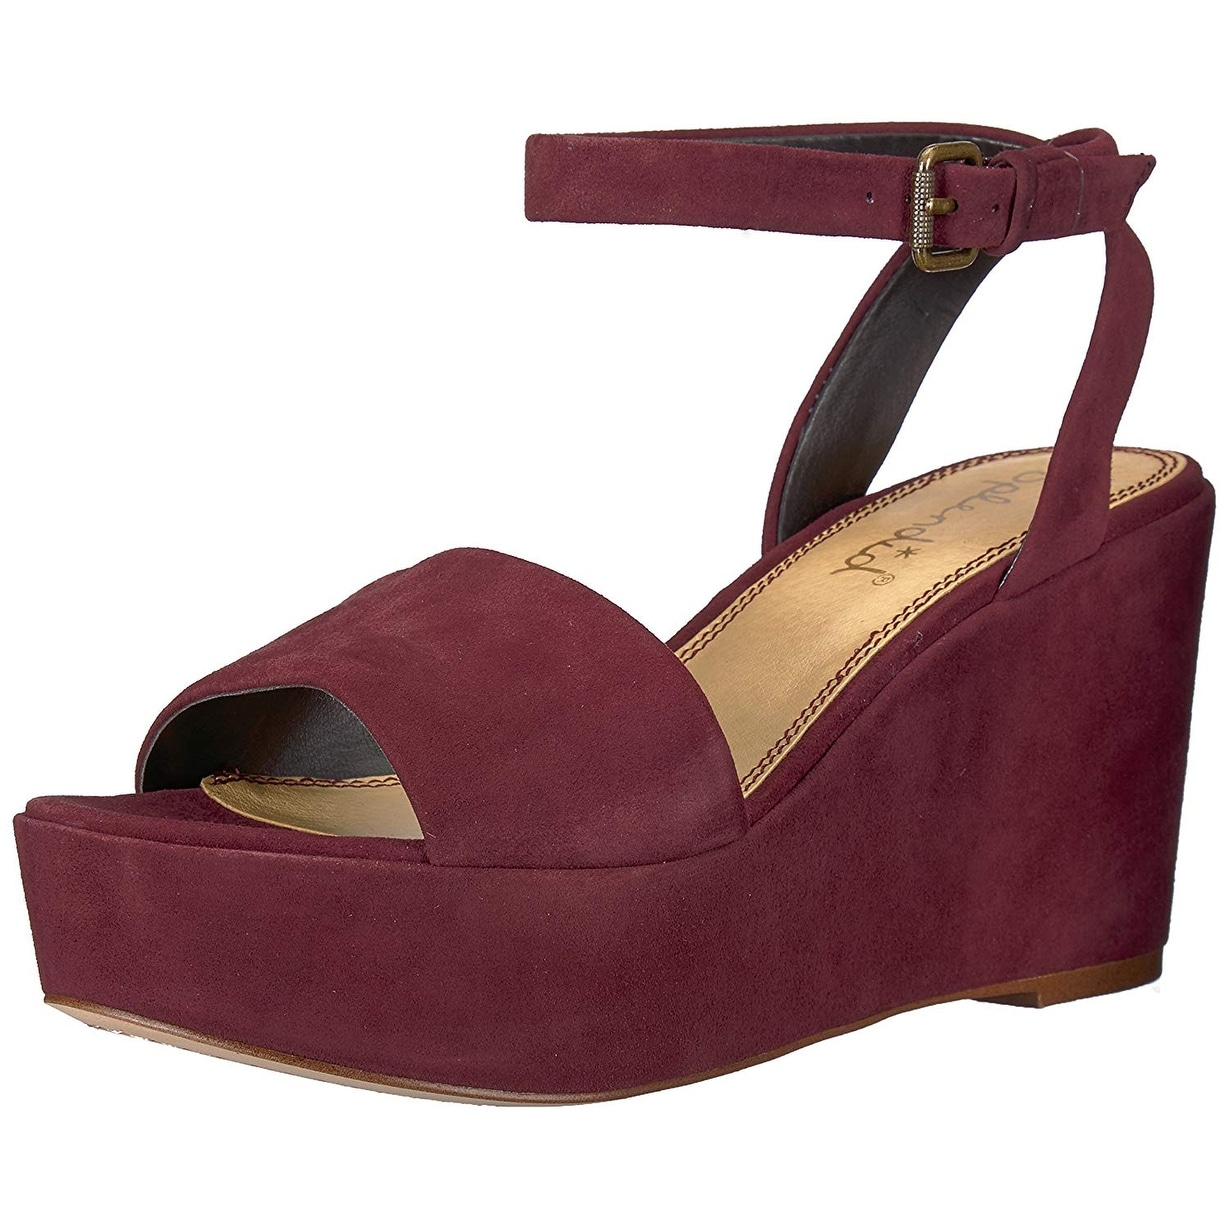 28d7bd1f4c Buy Splendid Women's Sandals Online at Overstock | Our Best Women's Shoes  Deals